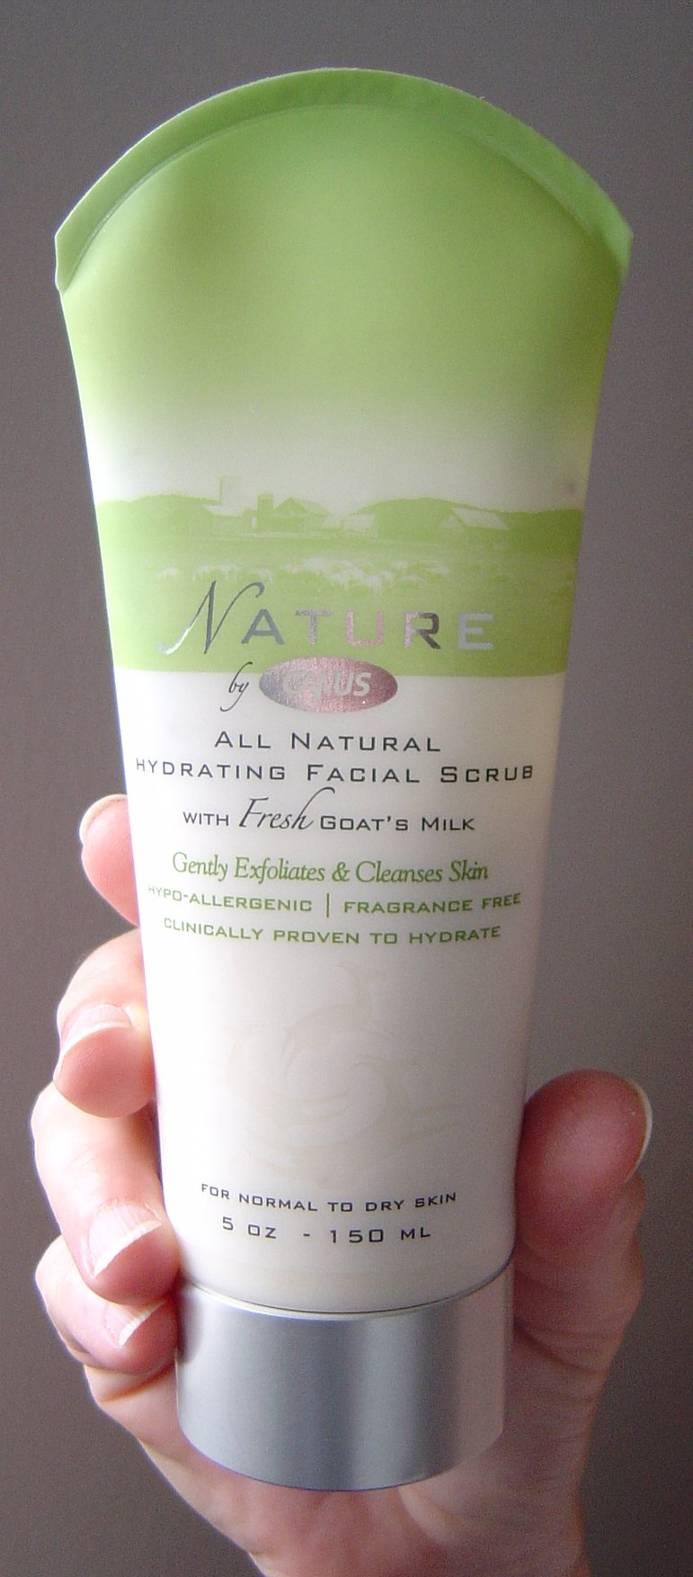 Nature by Canus Hydrating Facial Scrub.jpeg